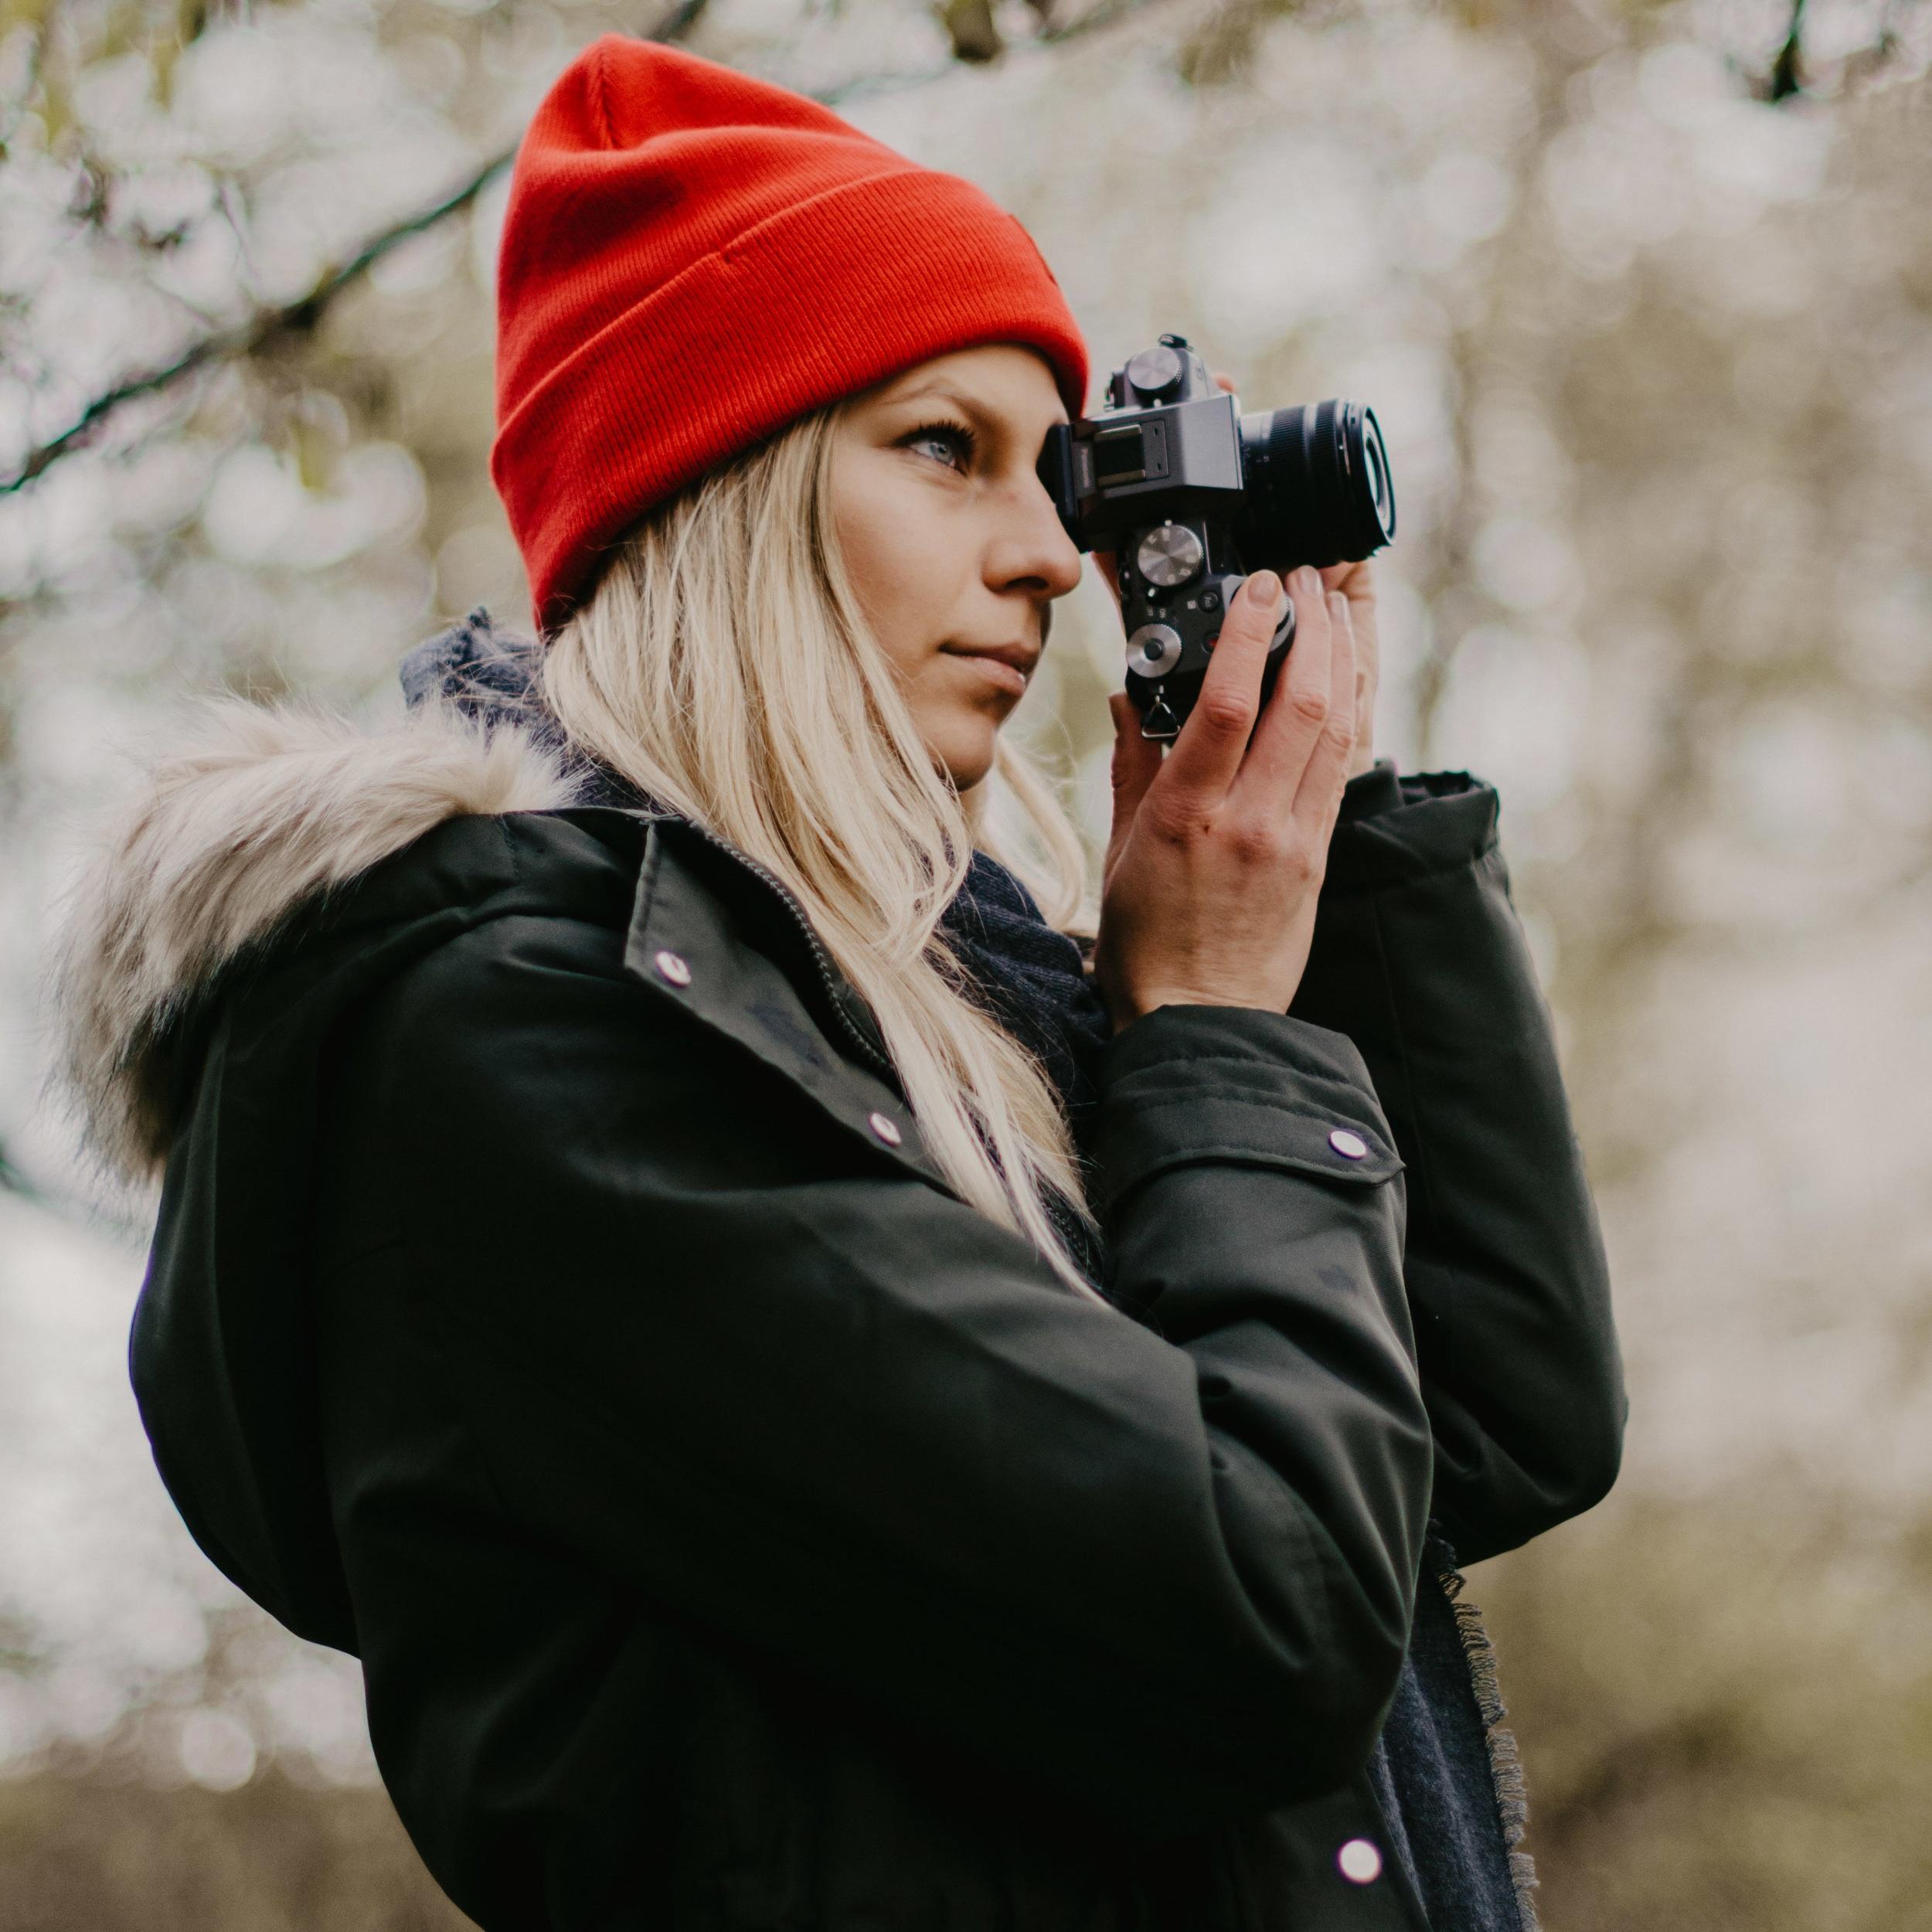 copenhagen-photographers-renate.jpg